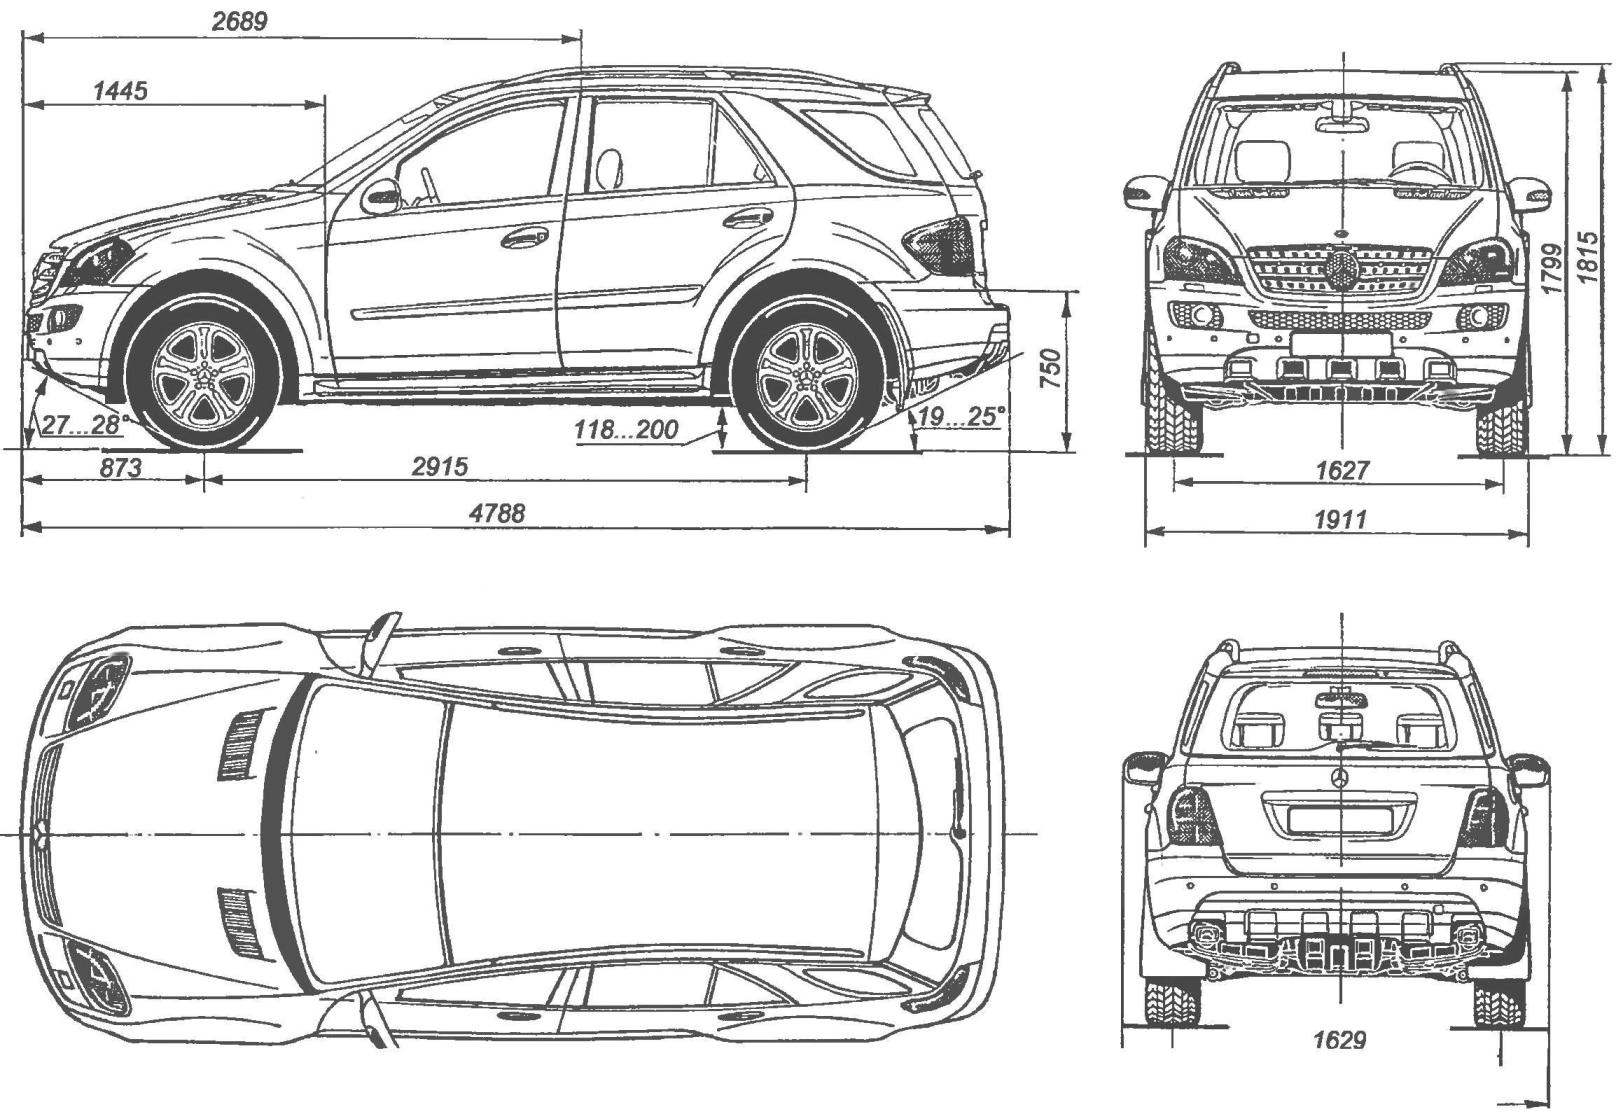 Geometric scheme of the car MERCEDES-BENZ ML-class